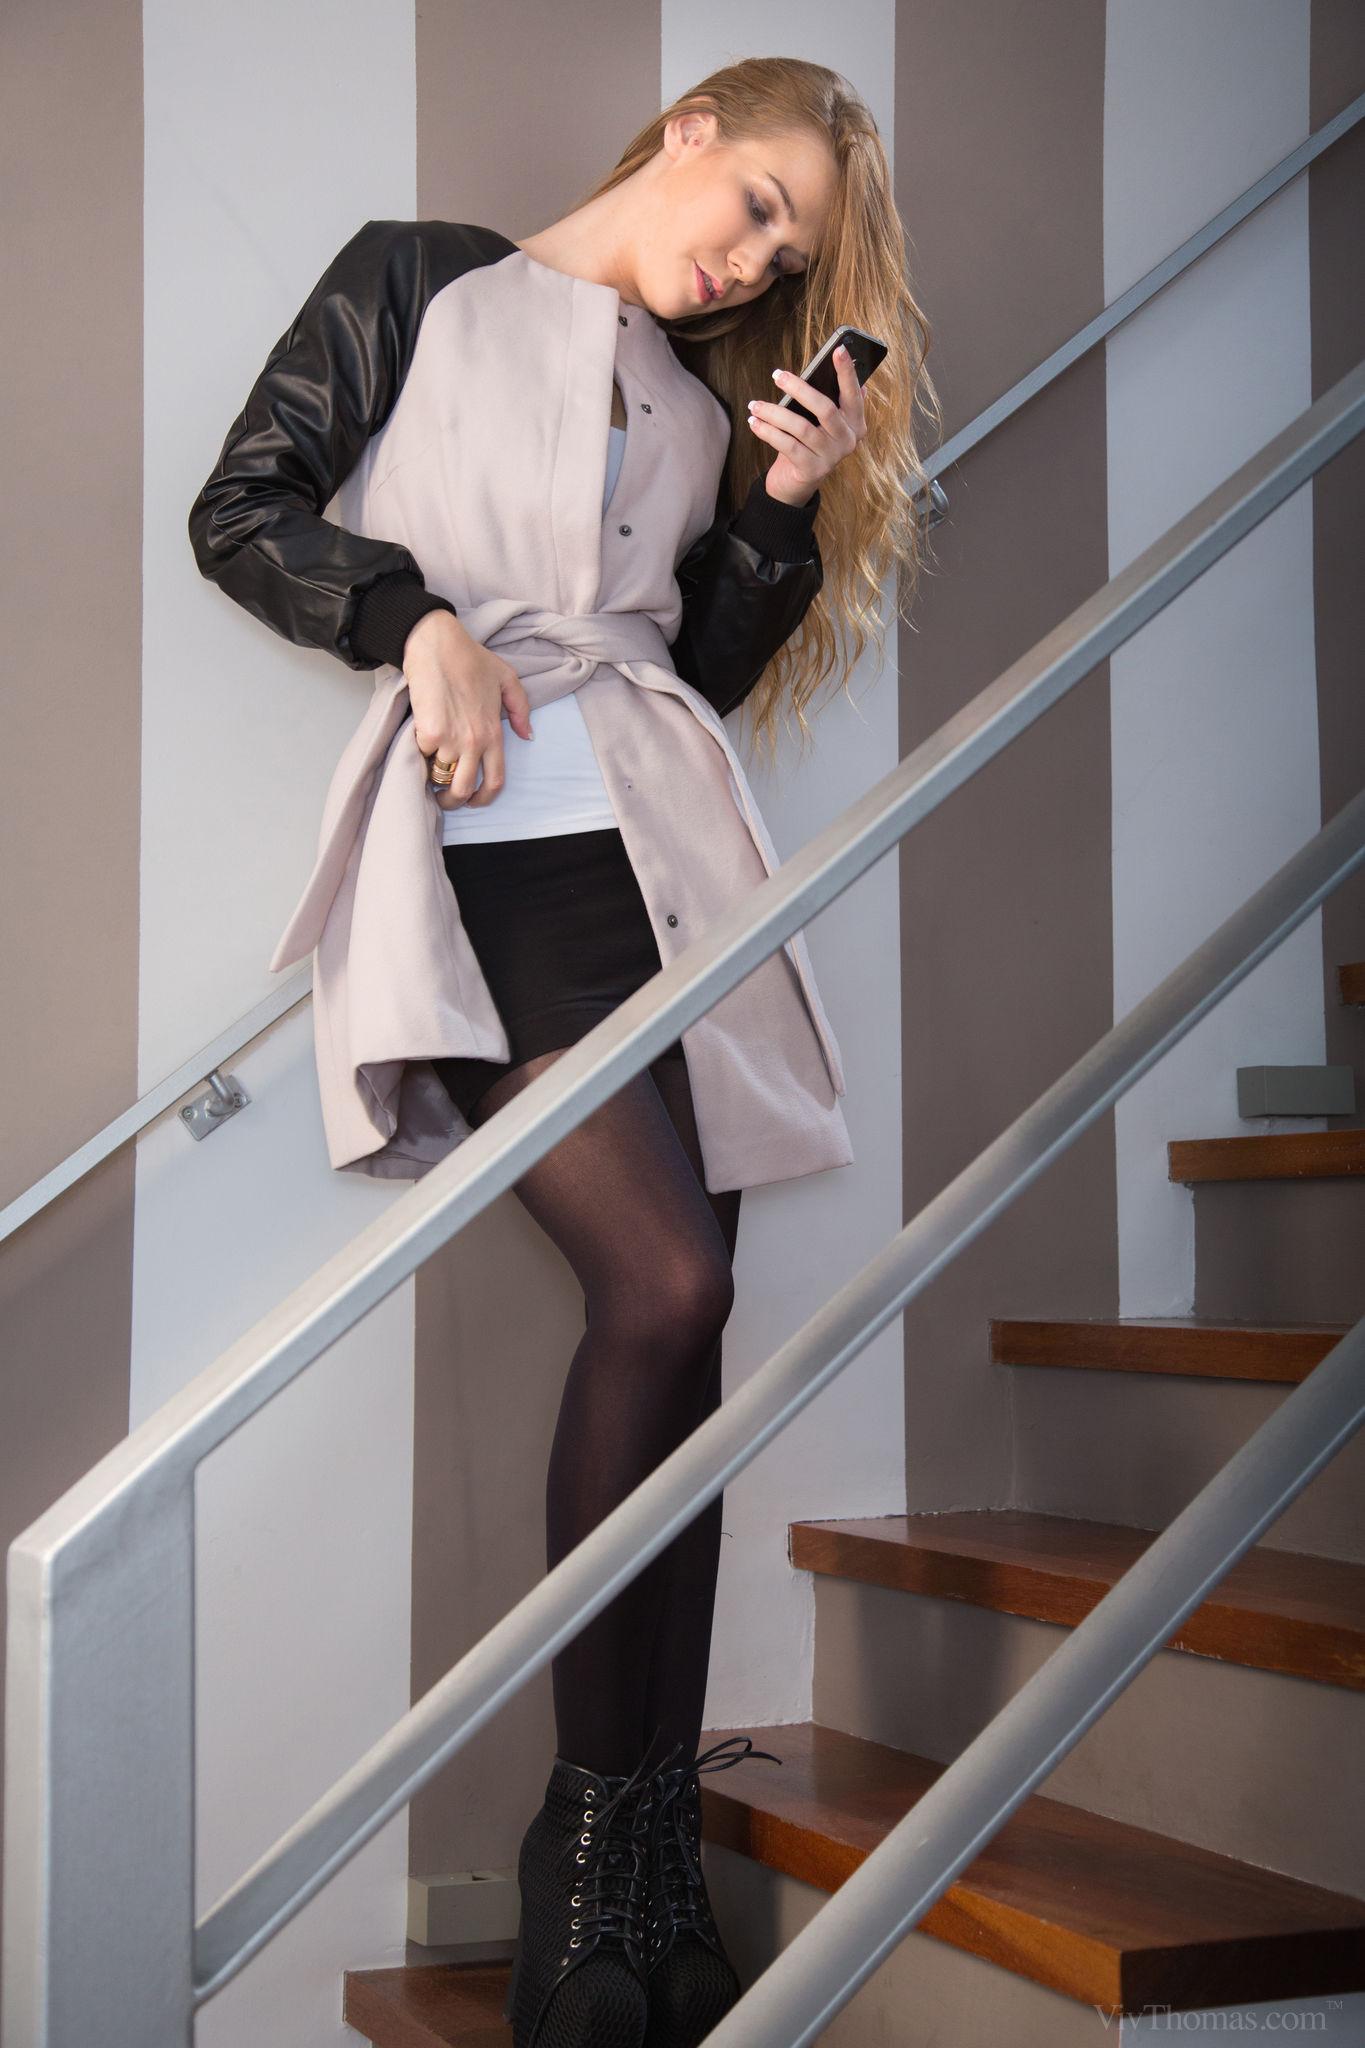 People 1365x2048 women Alexis Crystal coats black skirts flashing stairs reading long hair white tops standing VivThomas pornstar women indoors black boots stockings